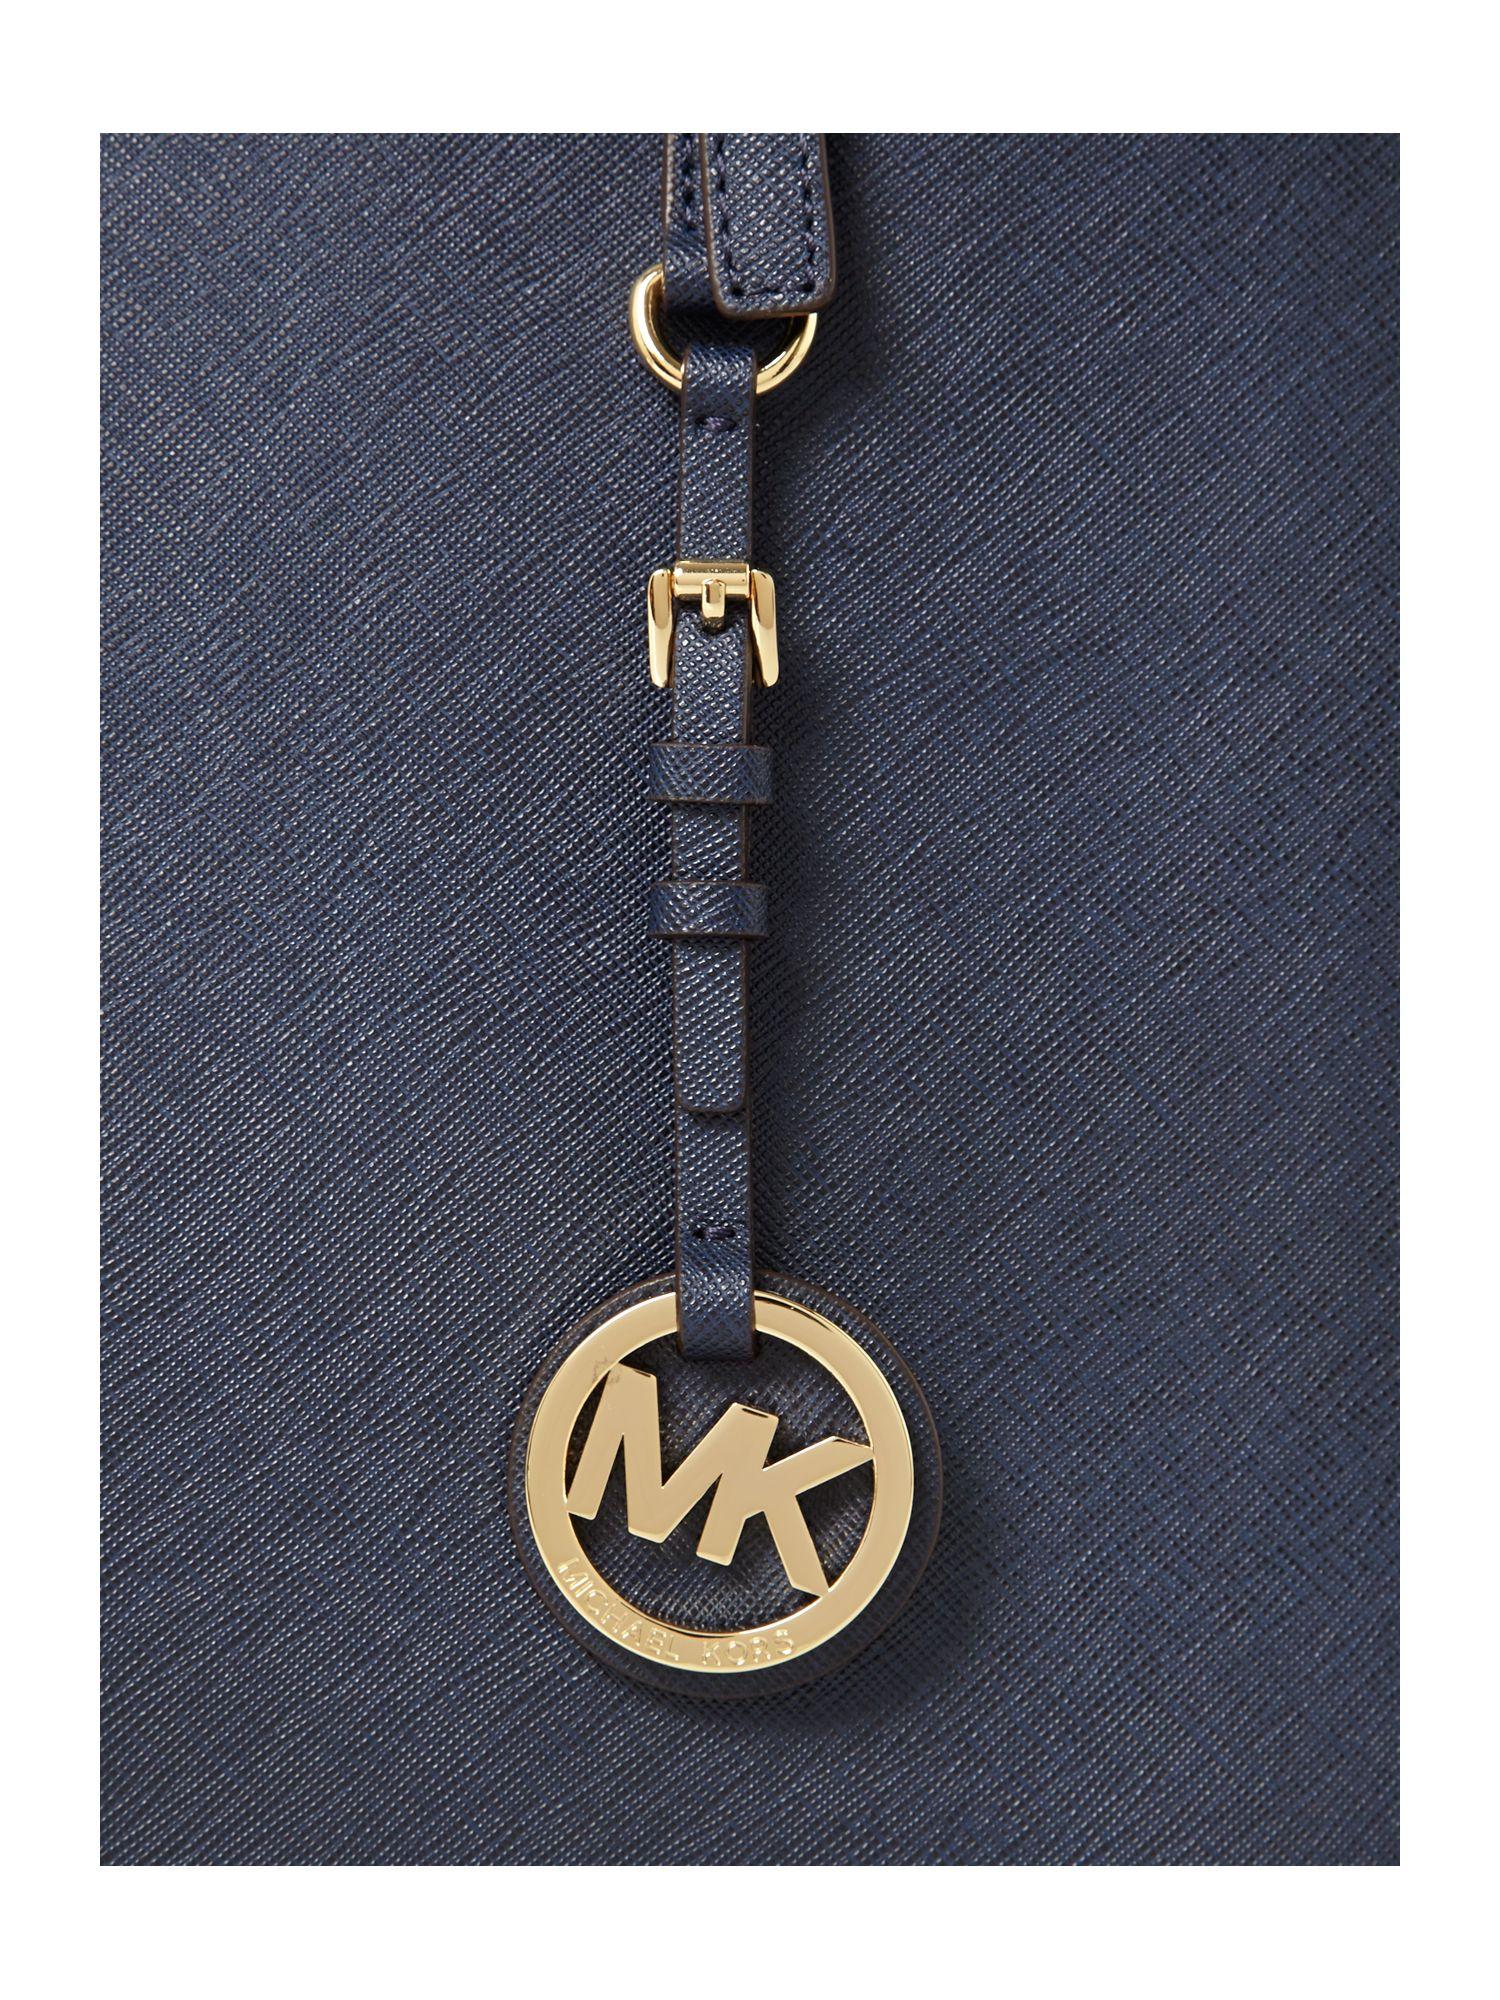 Michael Kors Leather Jet Set Travel Medium Tote Bag in Navy (Blue)